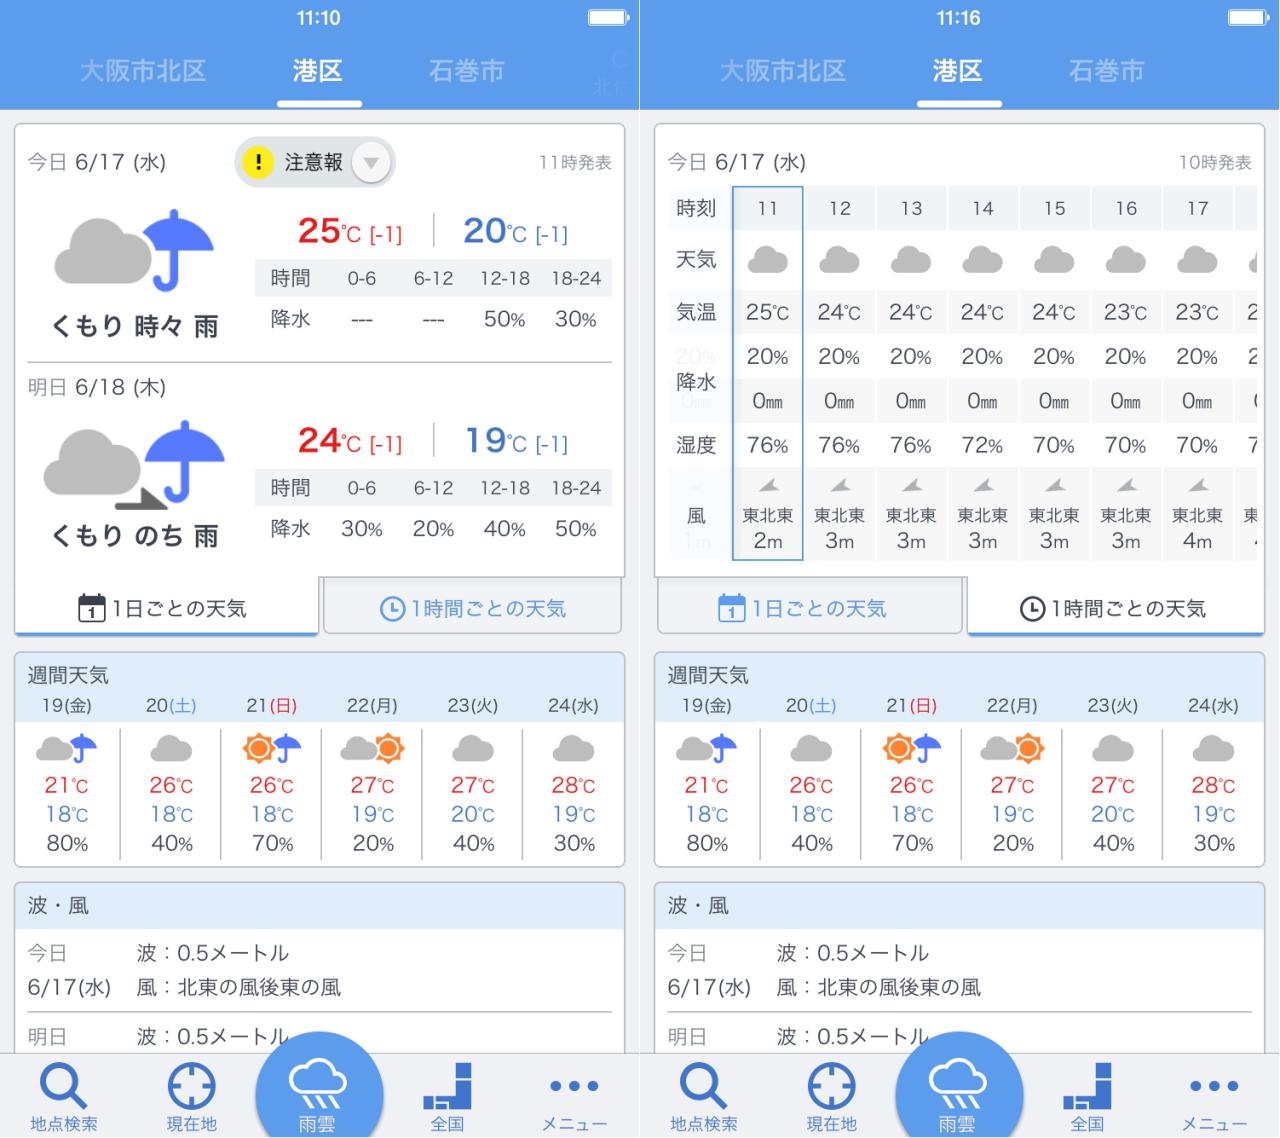 Yahoo!天気・災害アプリがバージョンアップしました